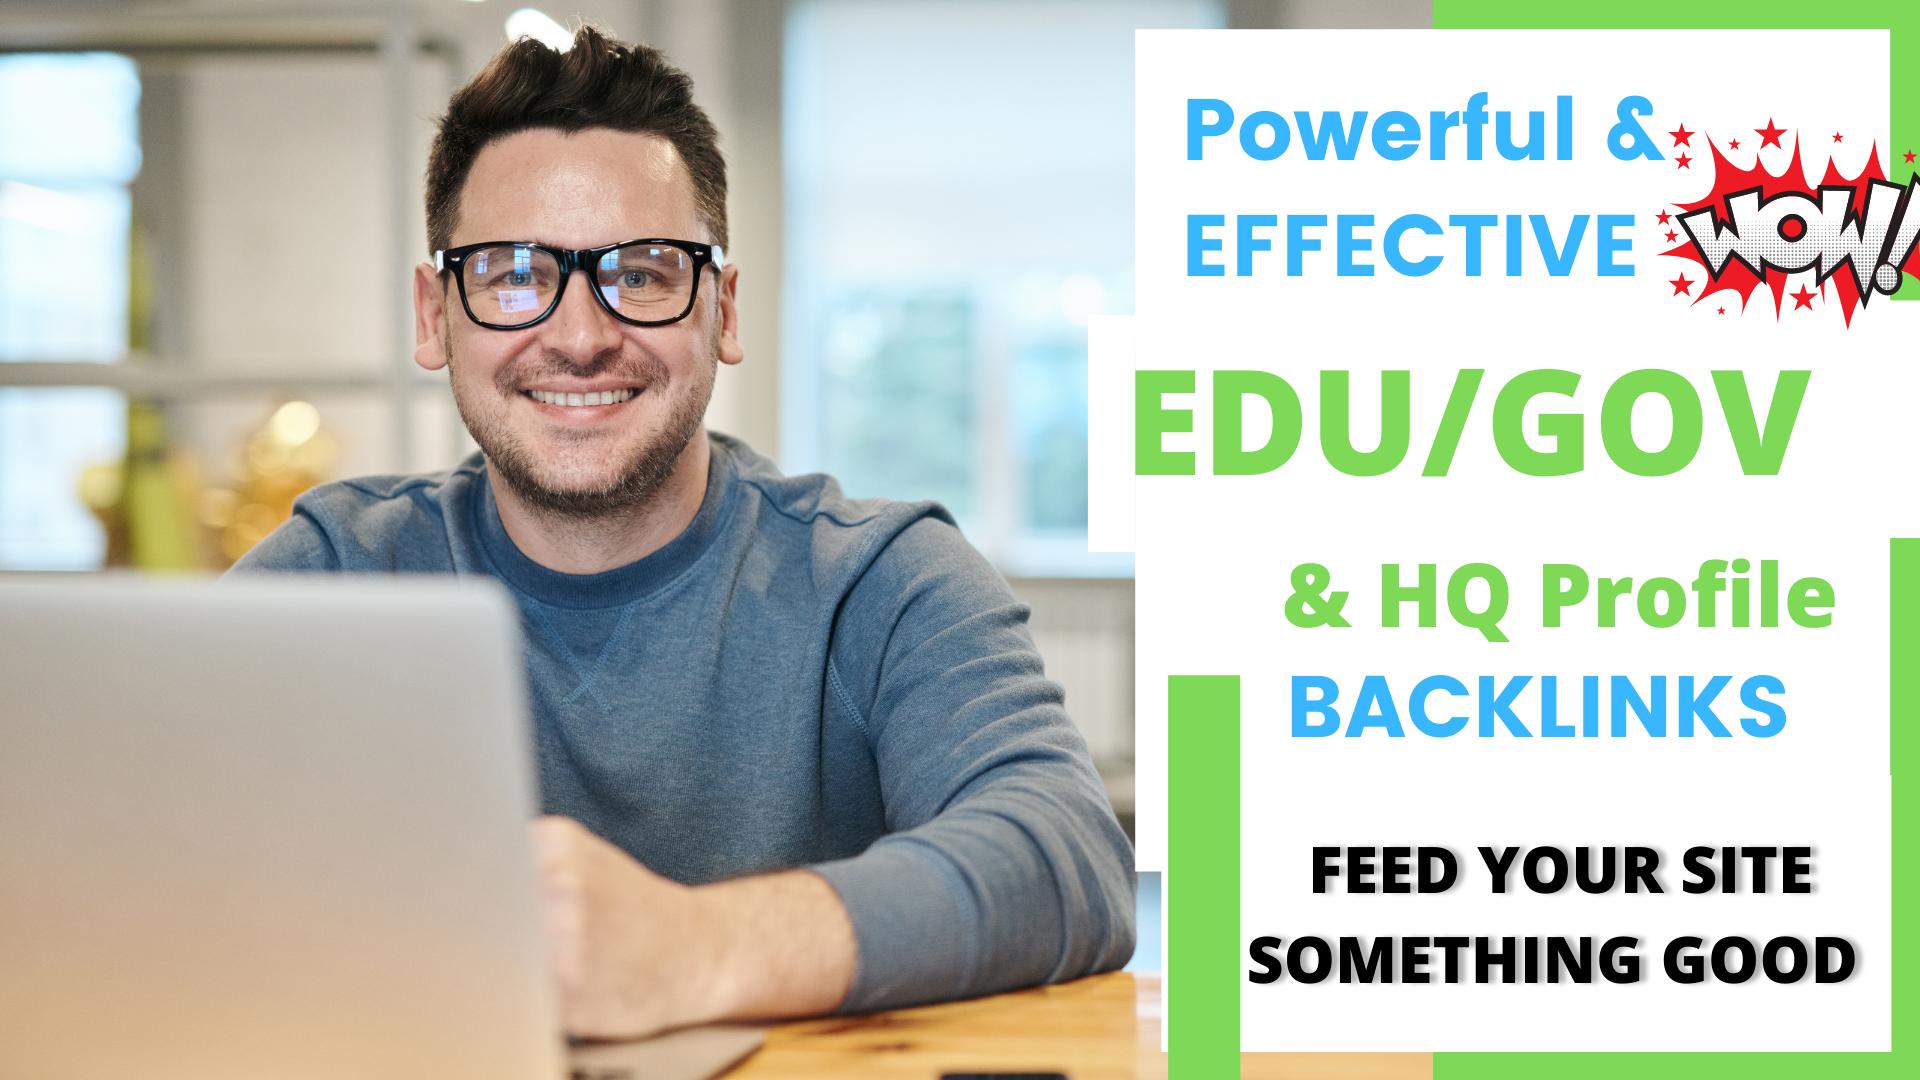 20 plus EDU/GOV & 100 DOFOLLOW HQ Profile Backlinks Premium Offer - Feed your site something good